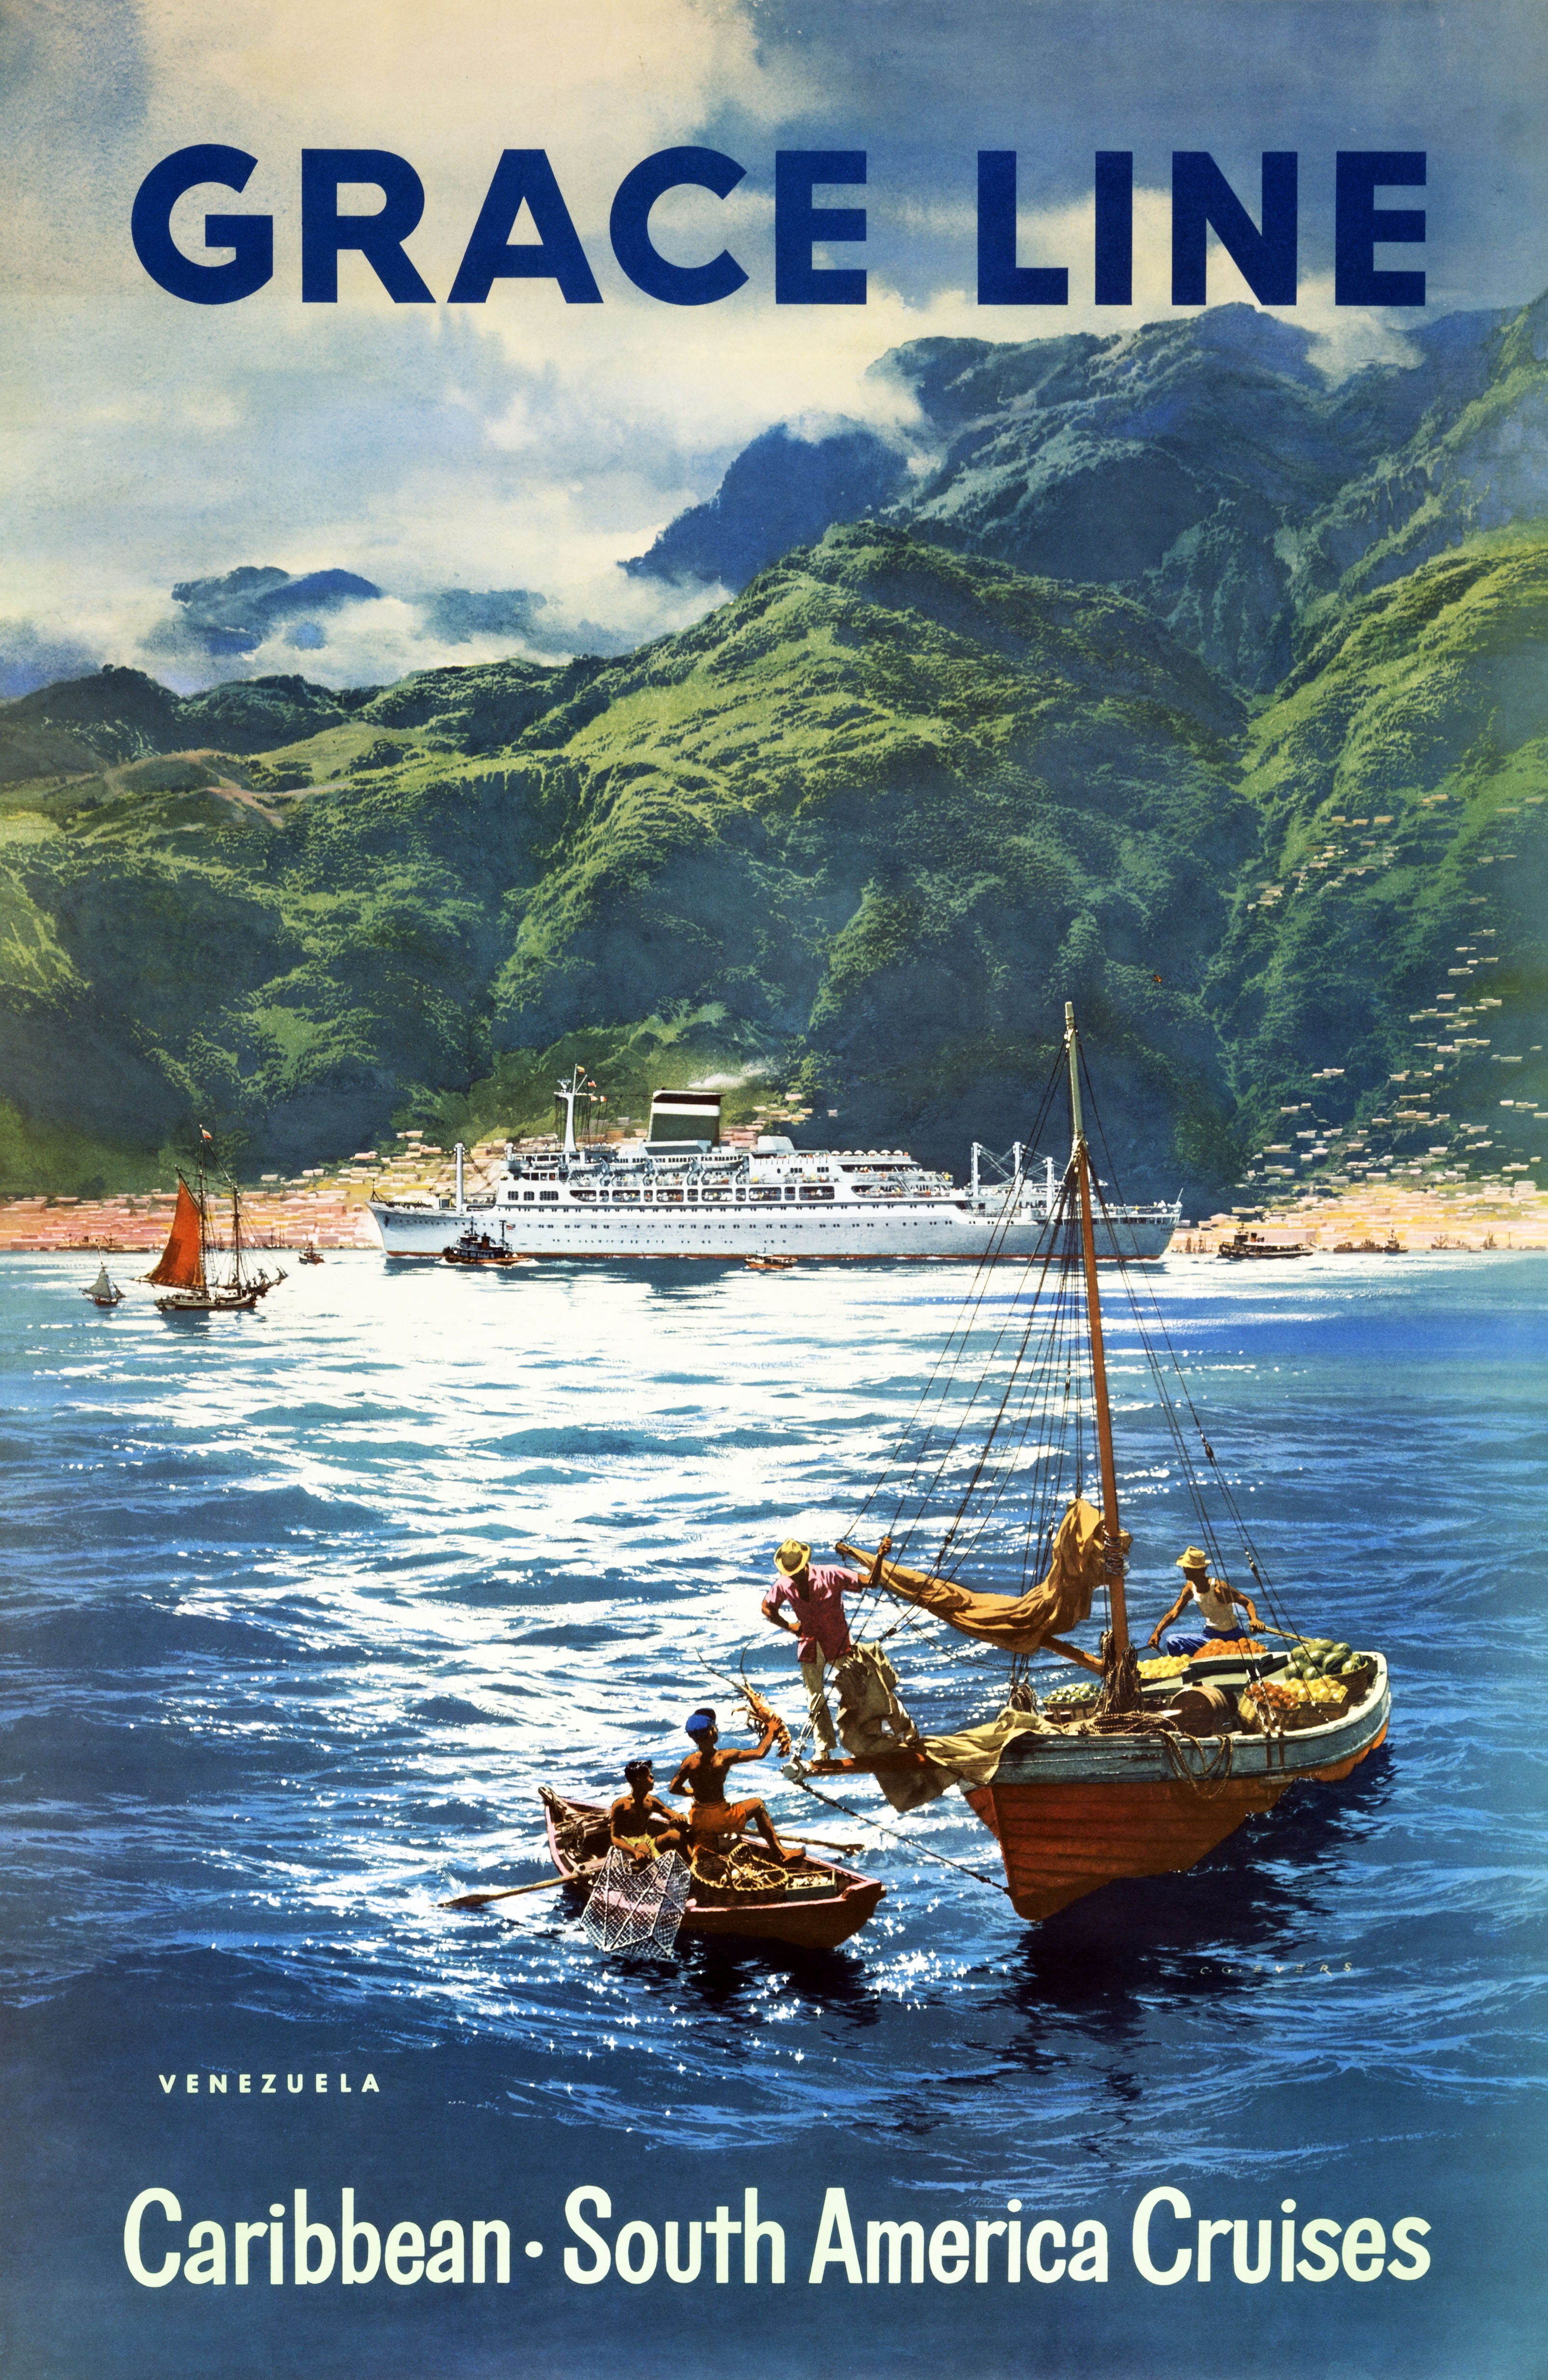 Grace Line cruise ship docks in tropics